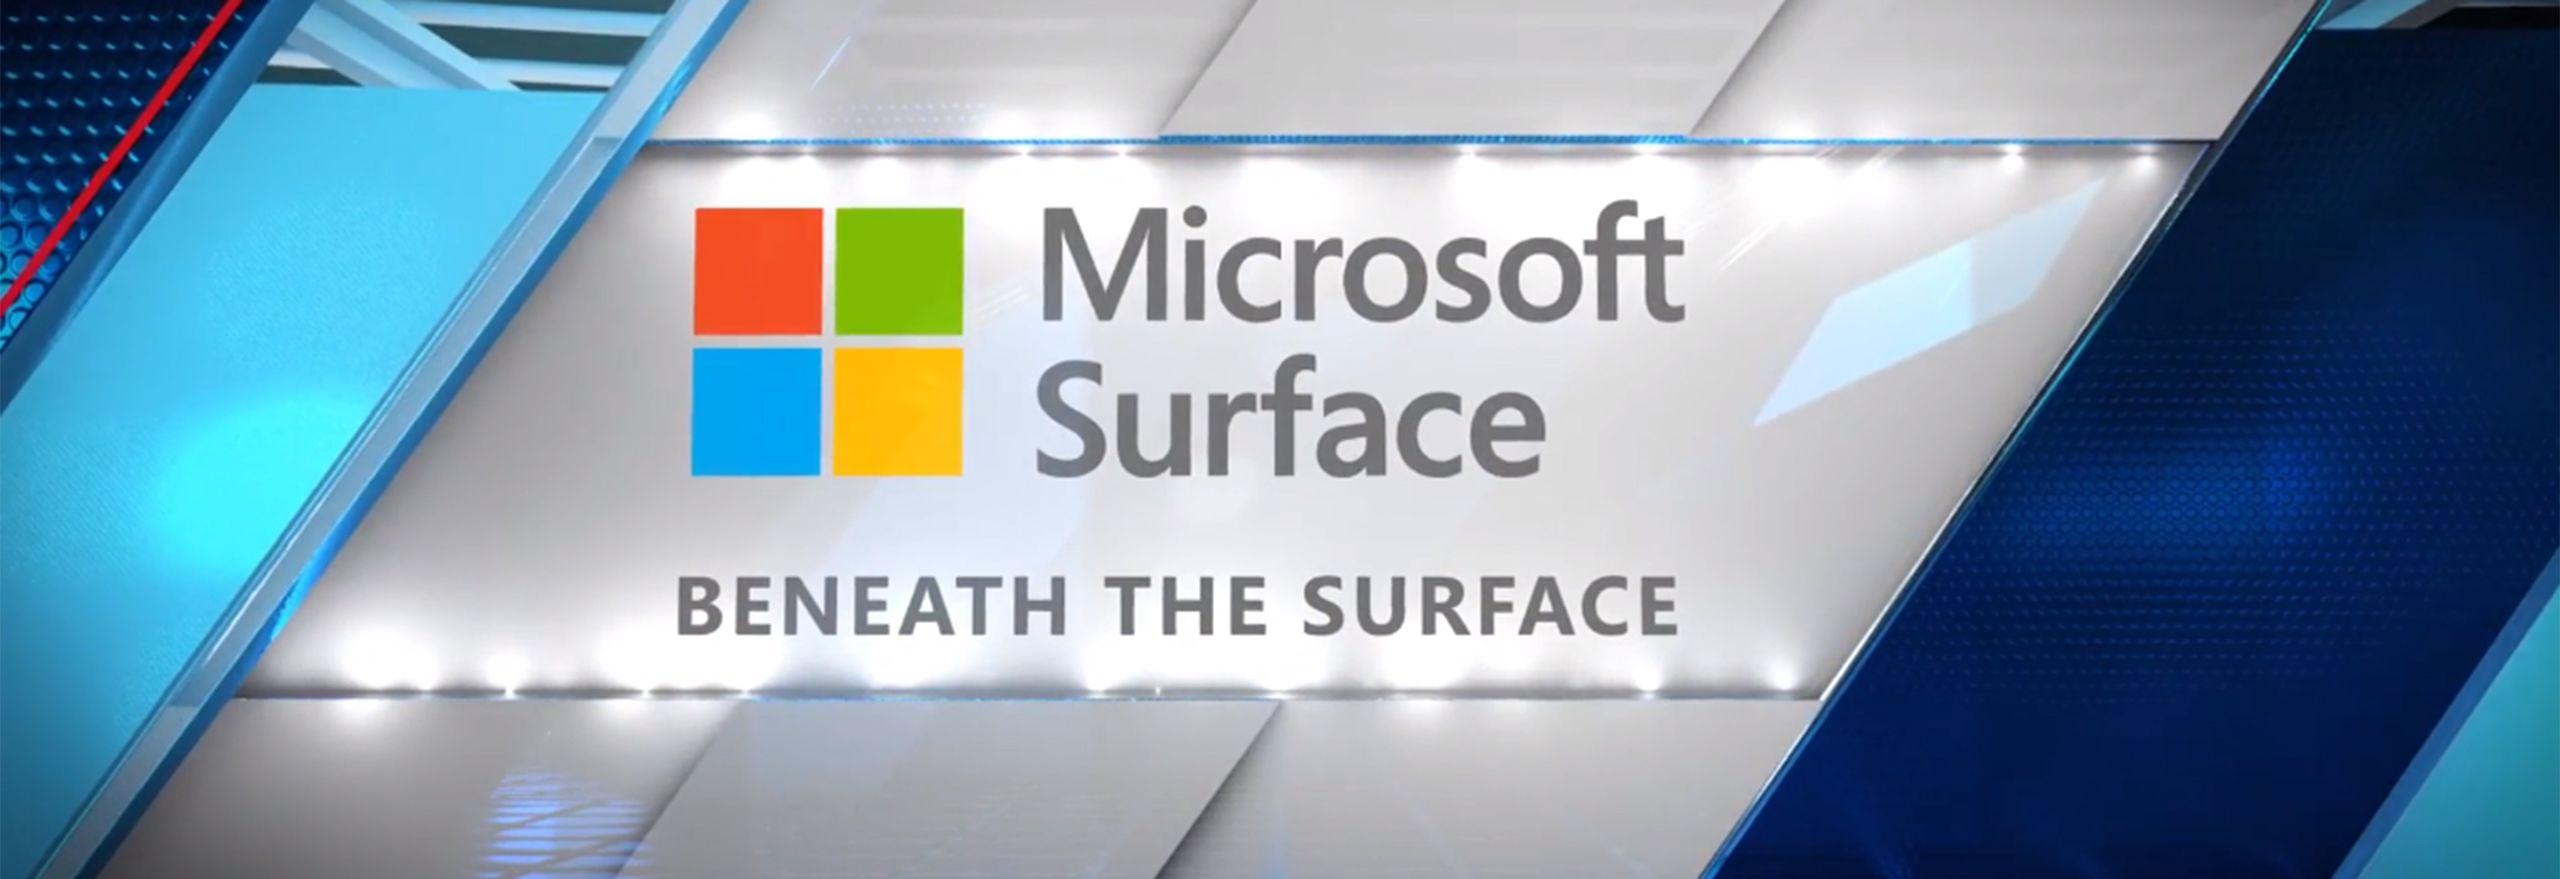 beneath-the-surface2560x879